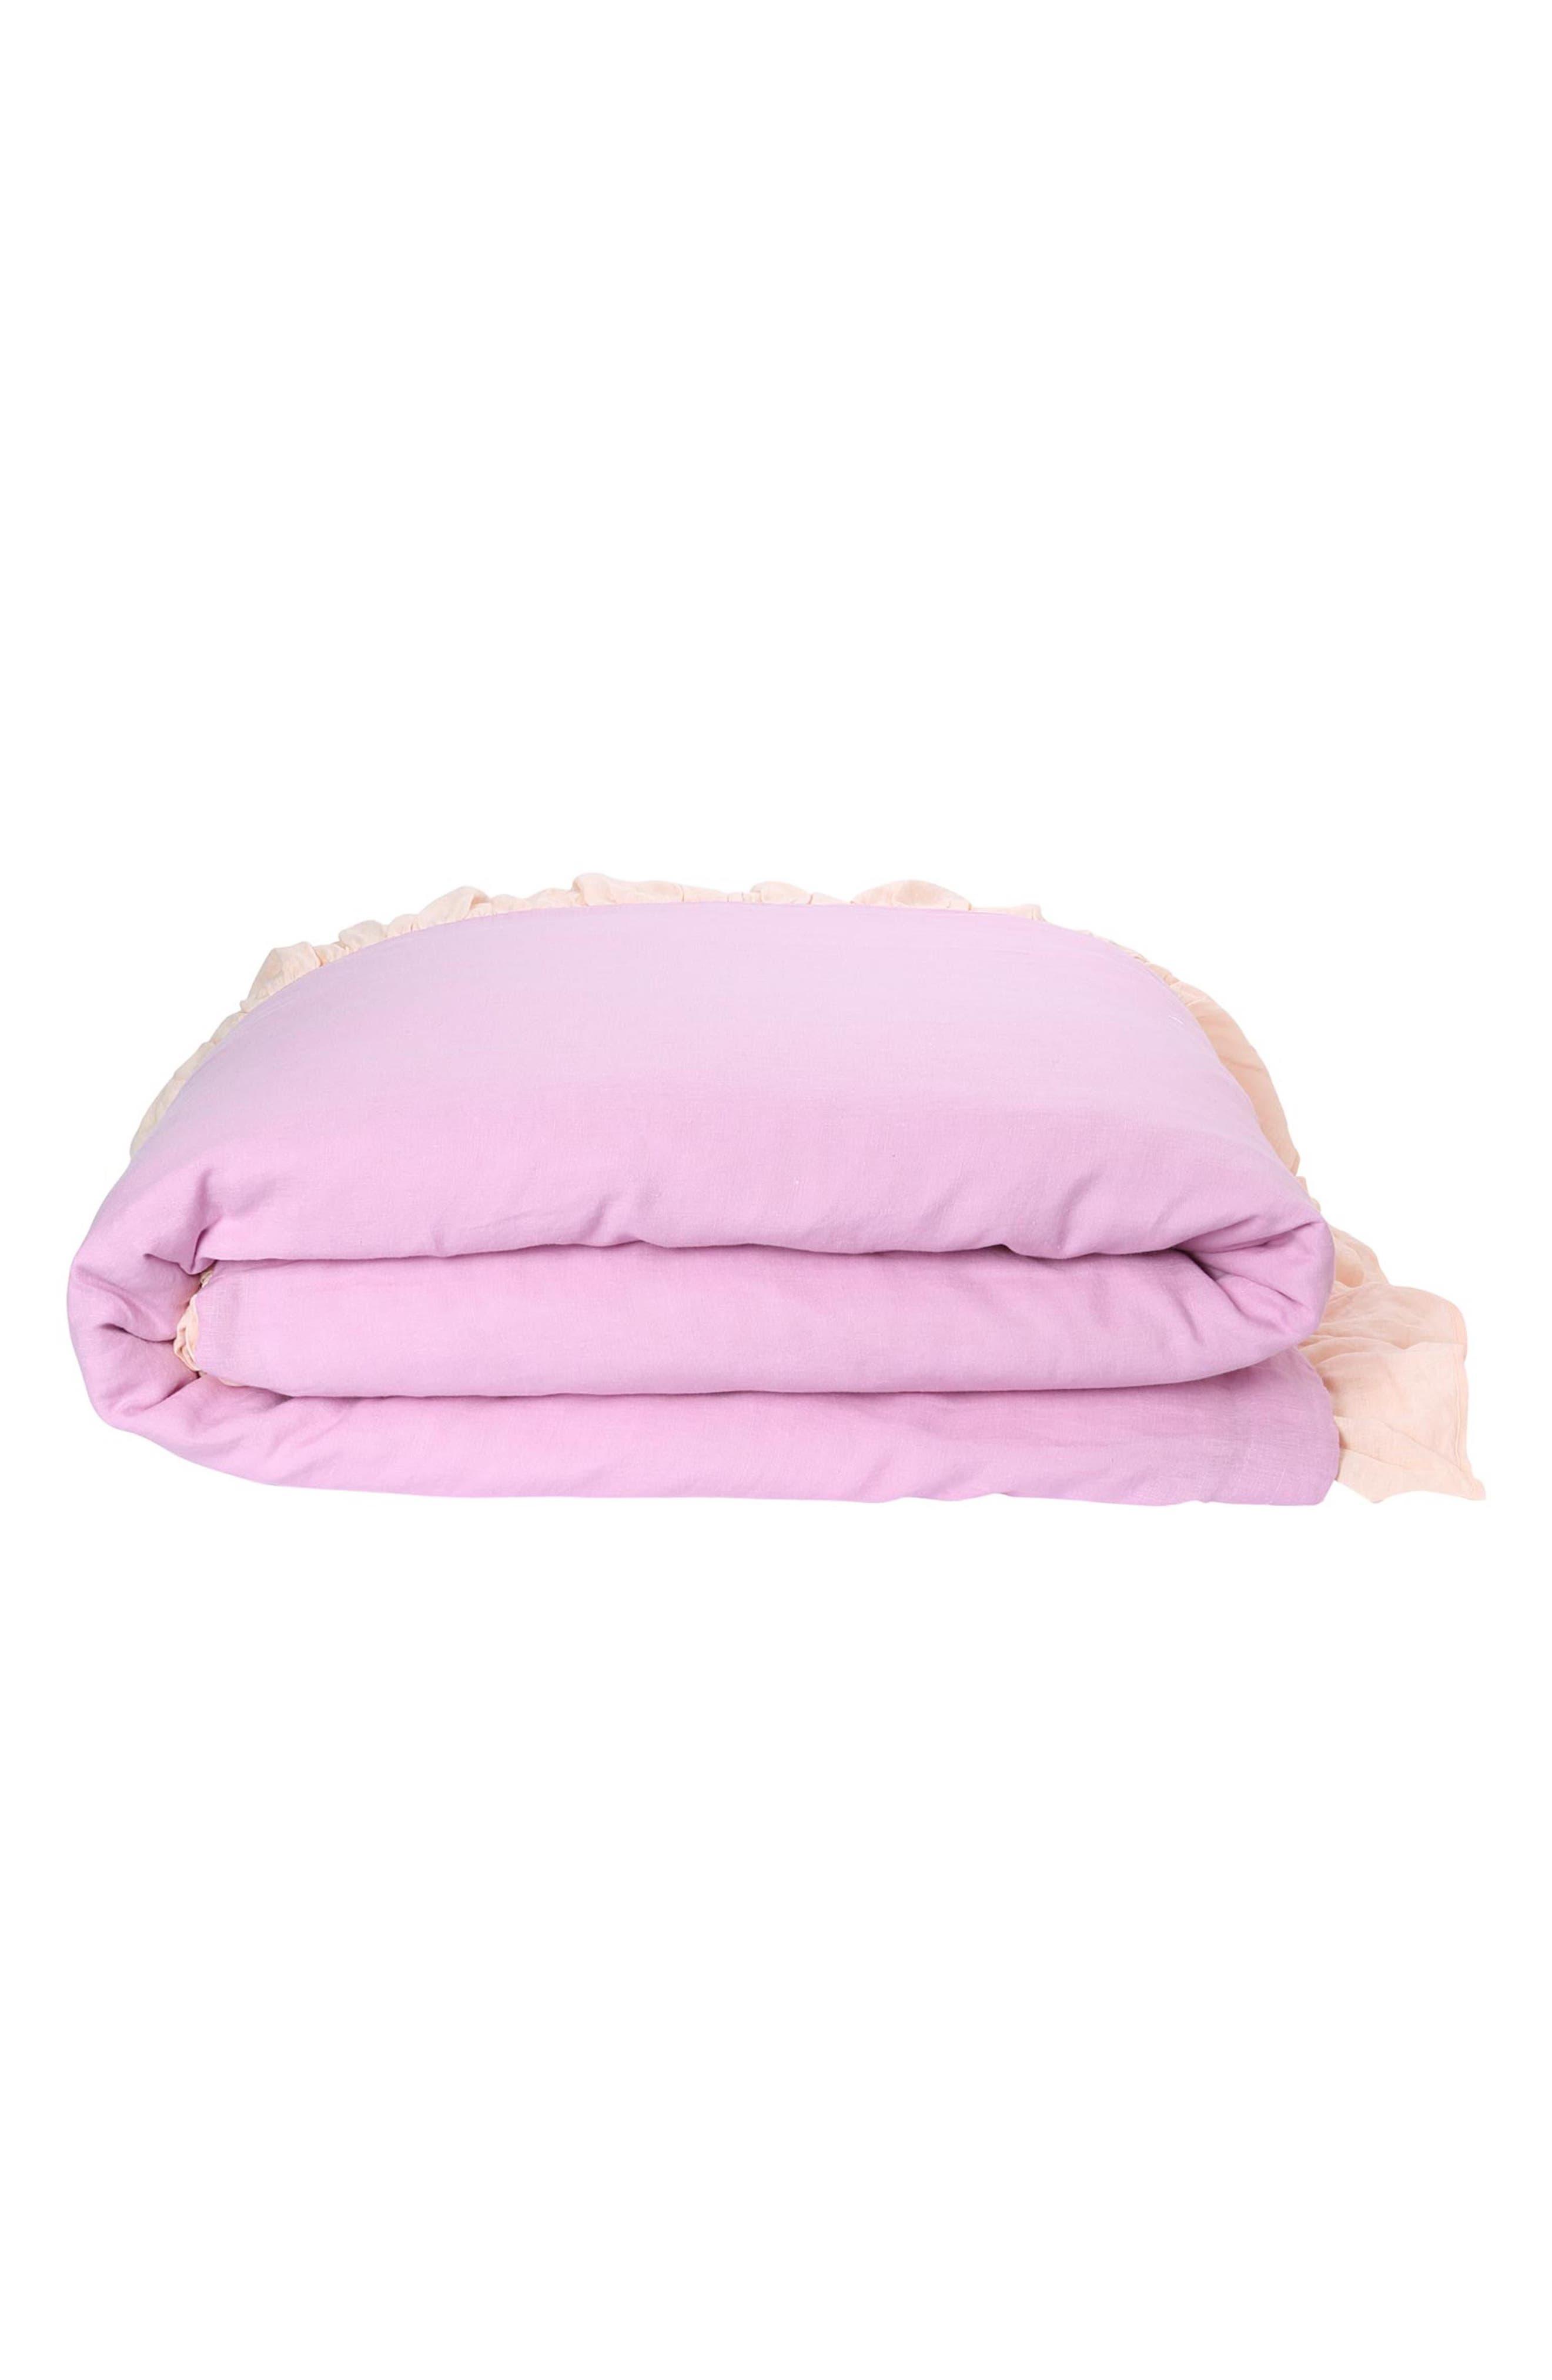 Ruffle Reversible Linen Comforter,                             Main thumbnail 1, color,                             900